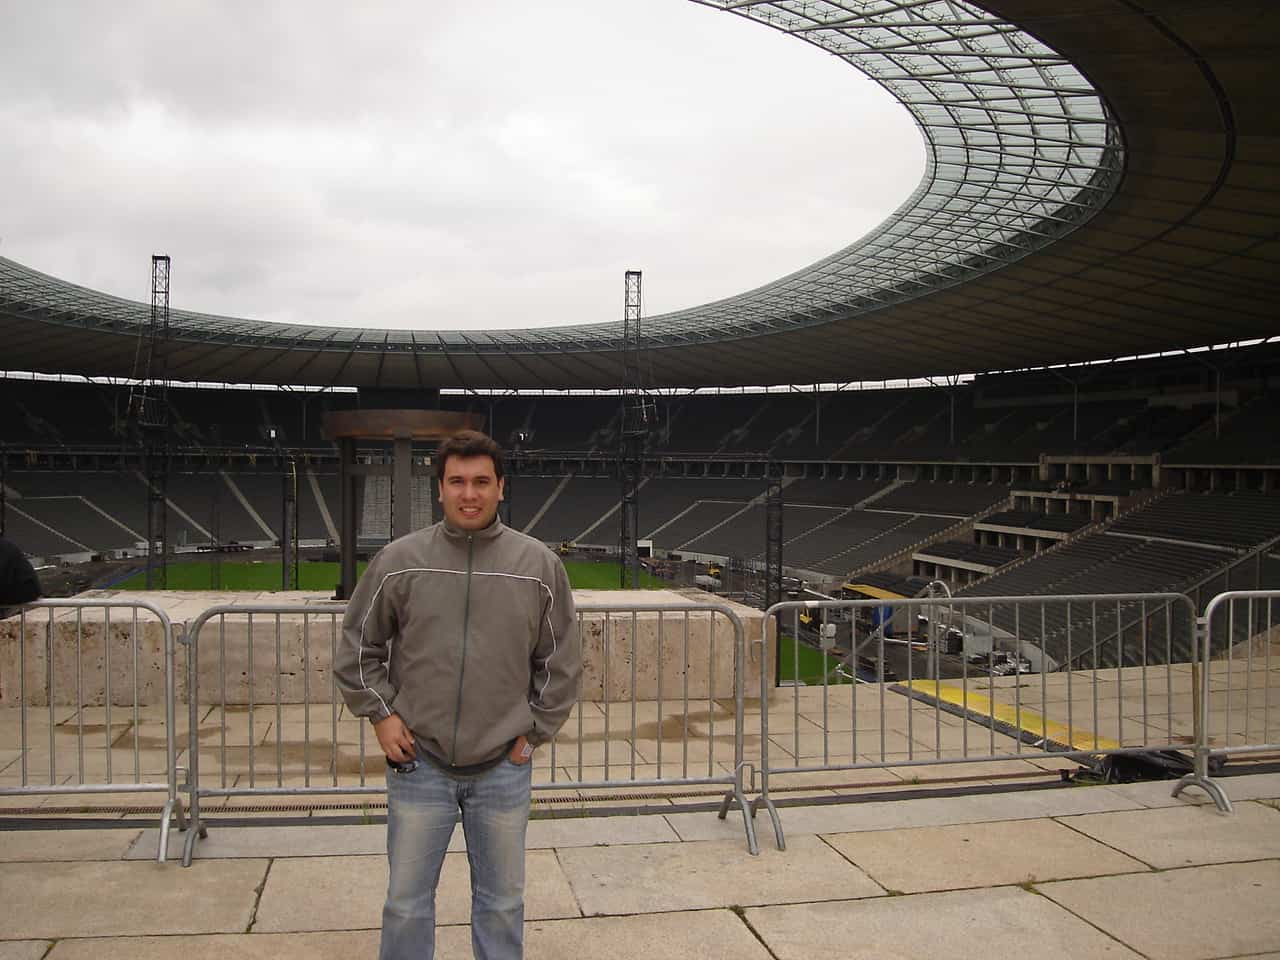 Interior do Estádio Olímpico de Berlim